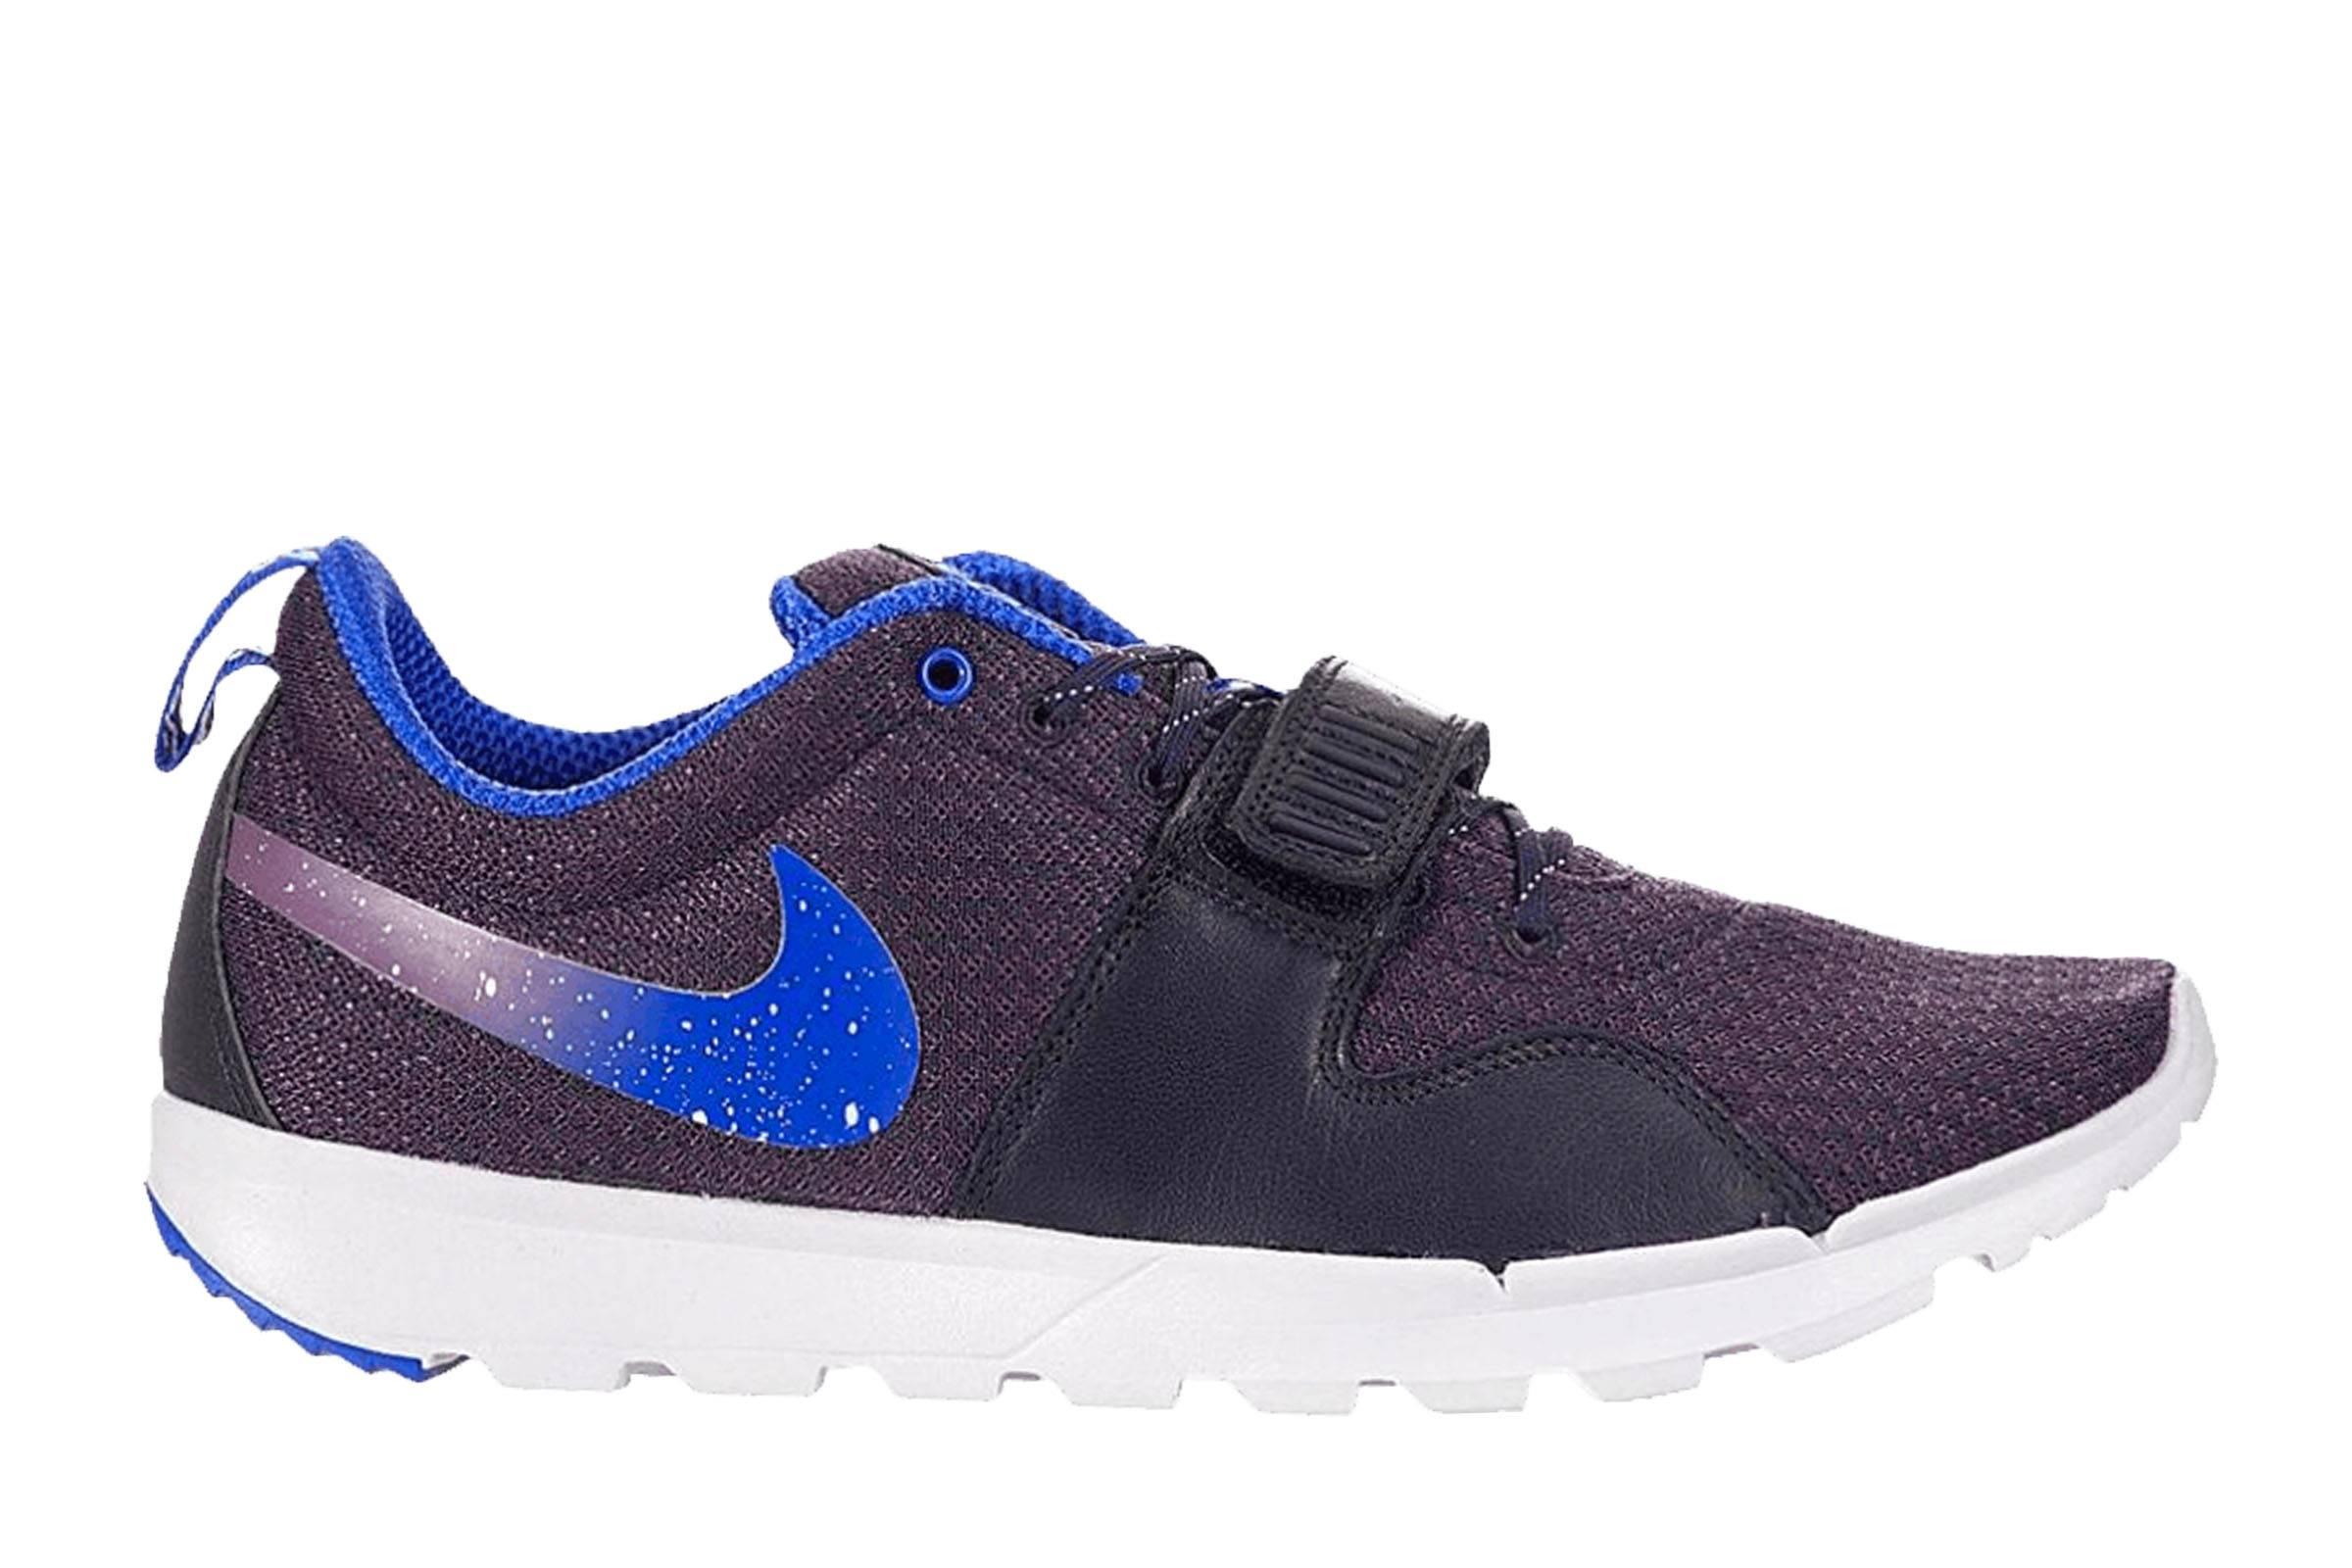 Stussy x Nike SB Trainerendor Low (2013)